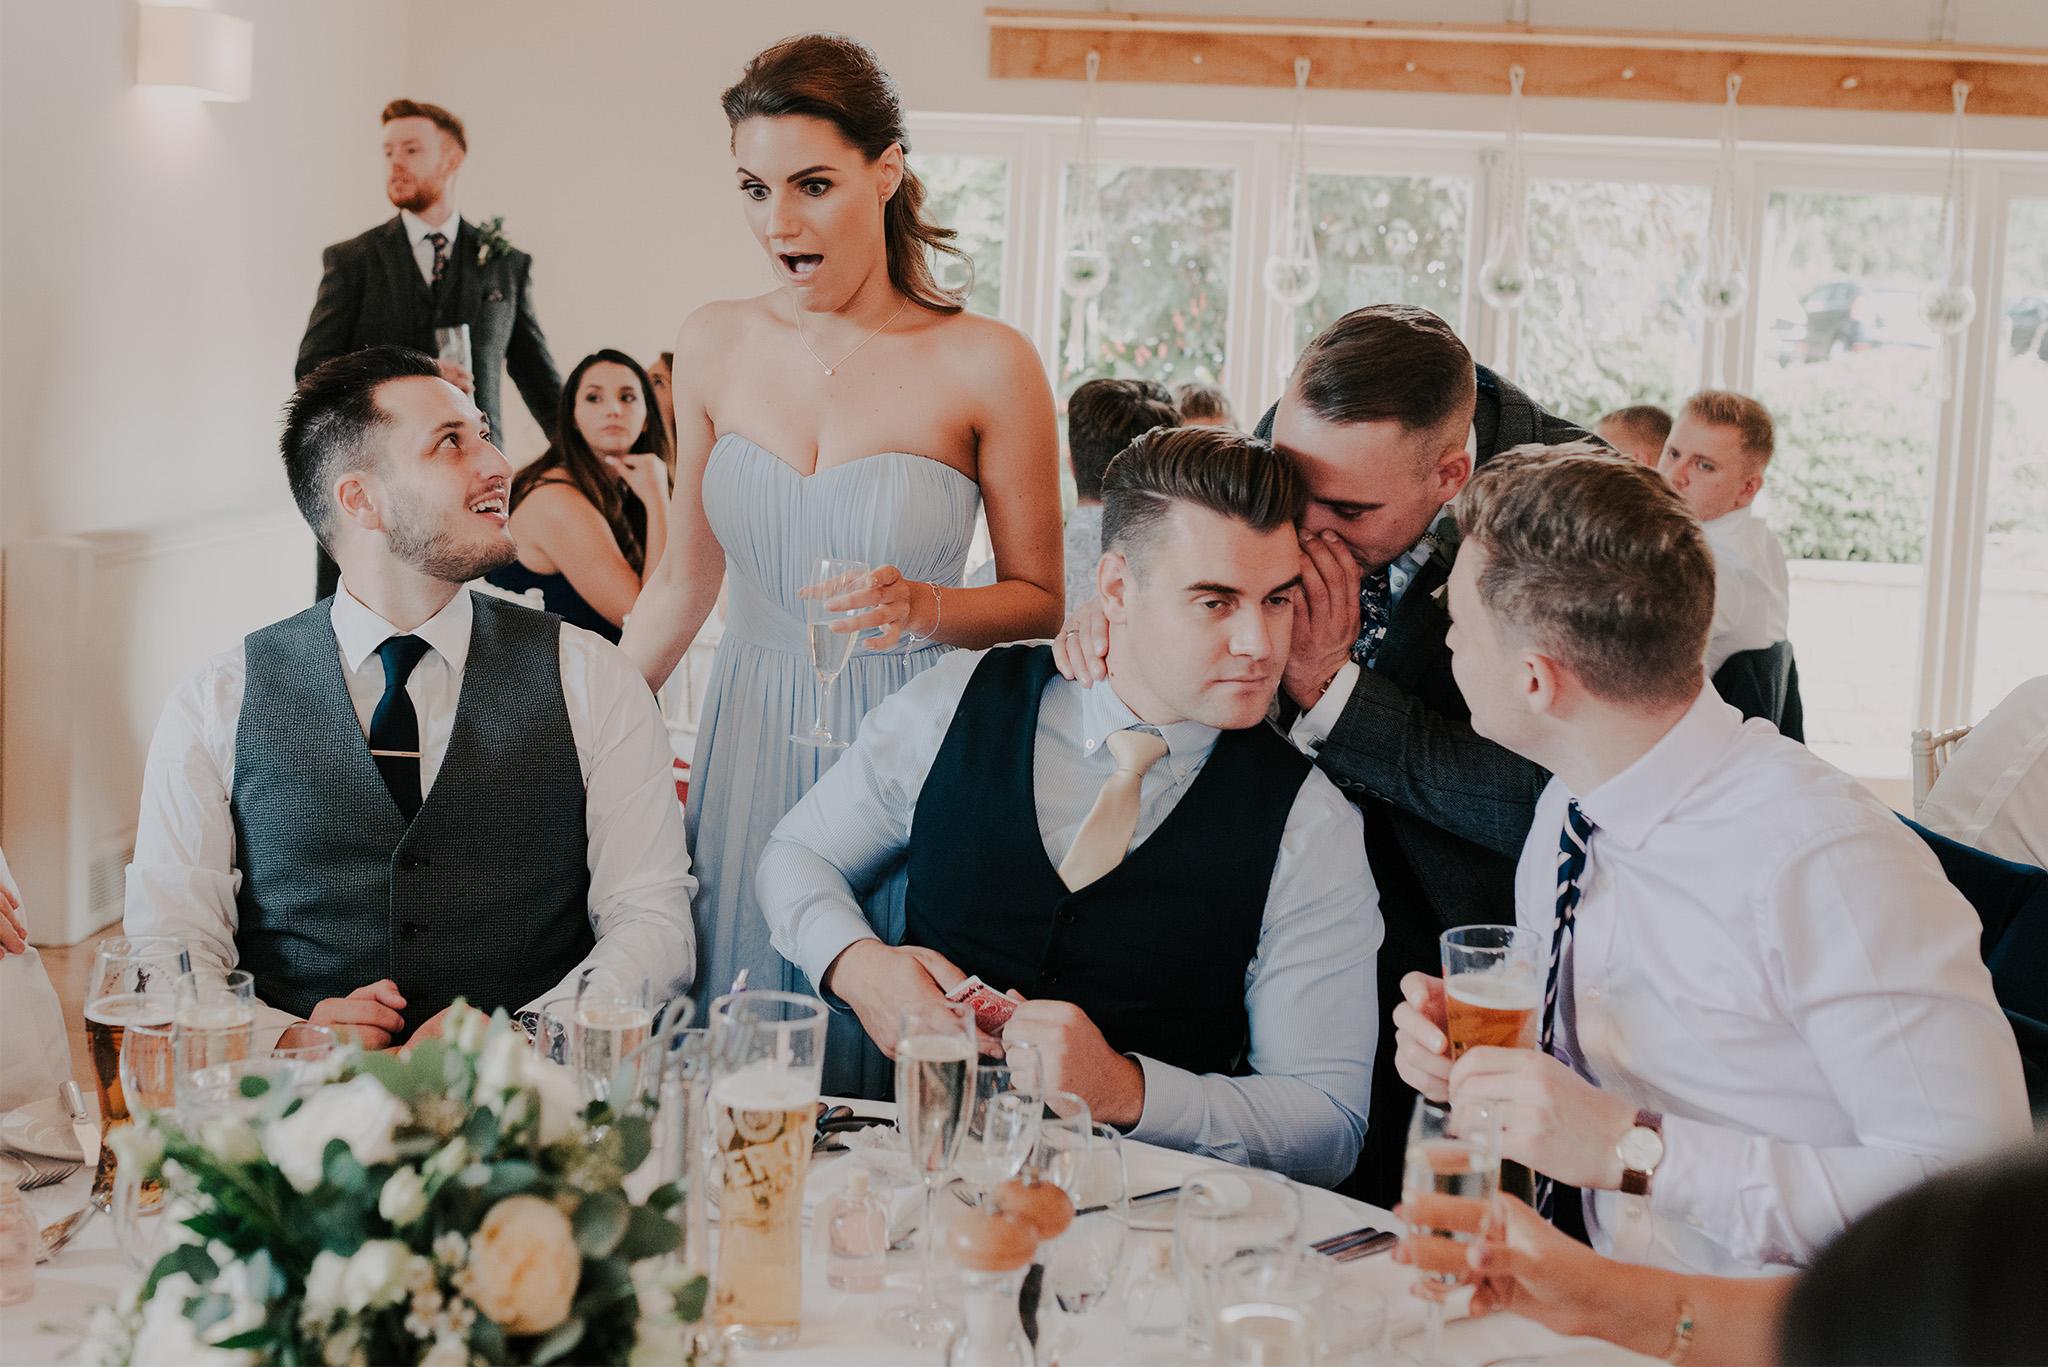 scott-stockwell-photography-wedding-47.jpg